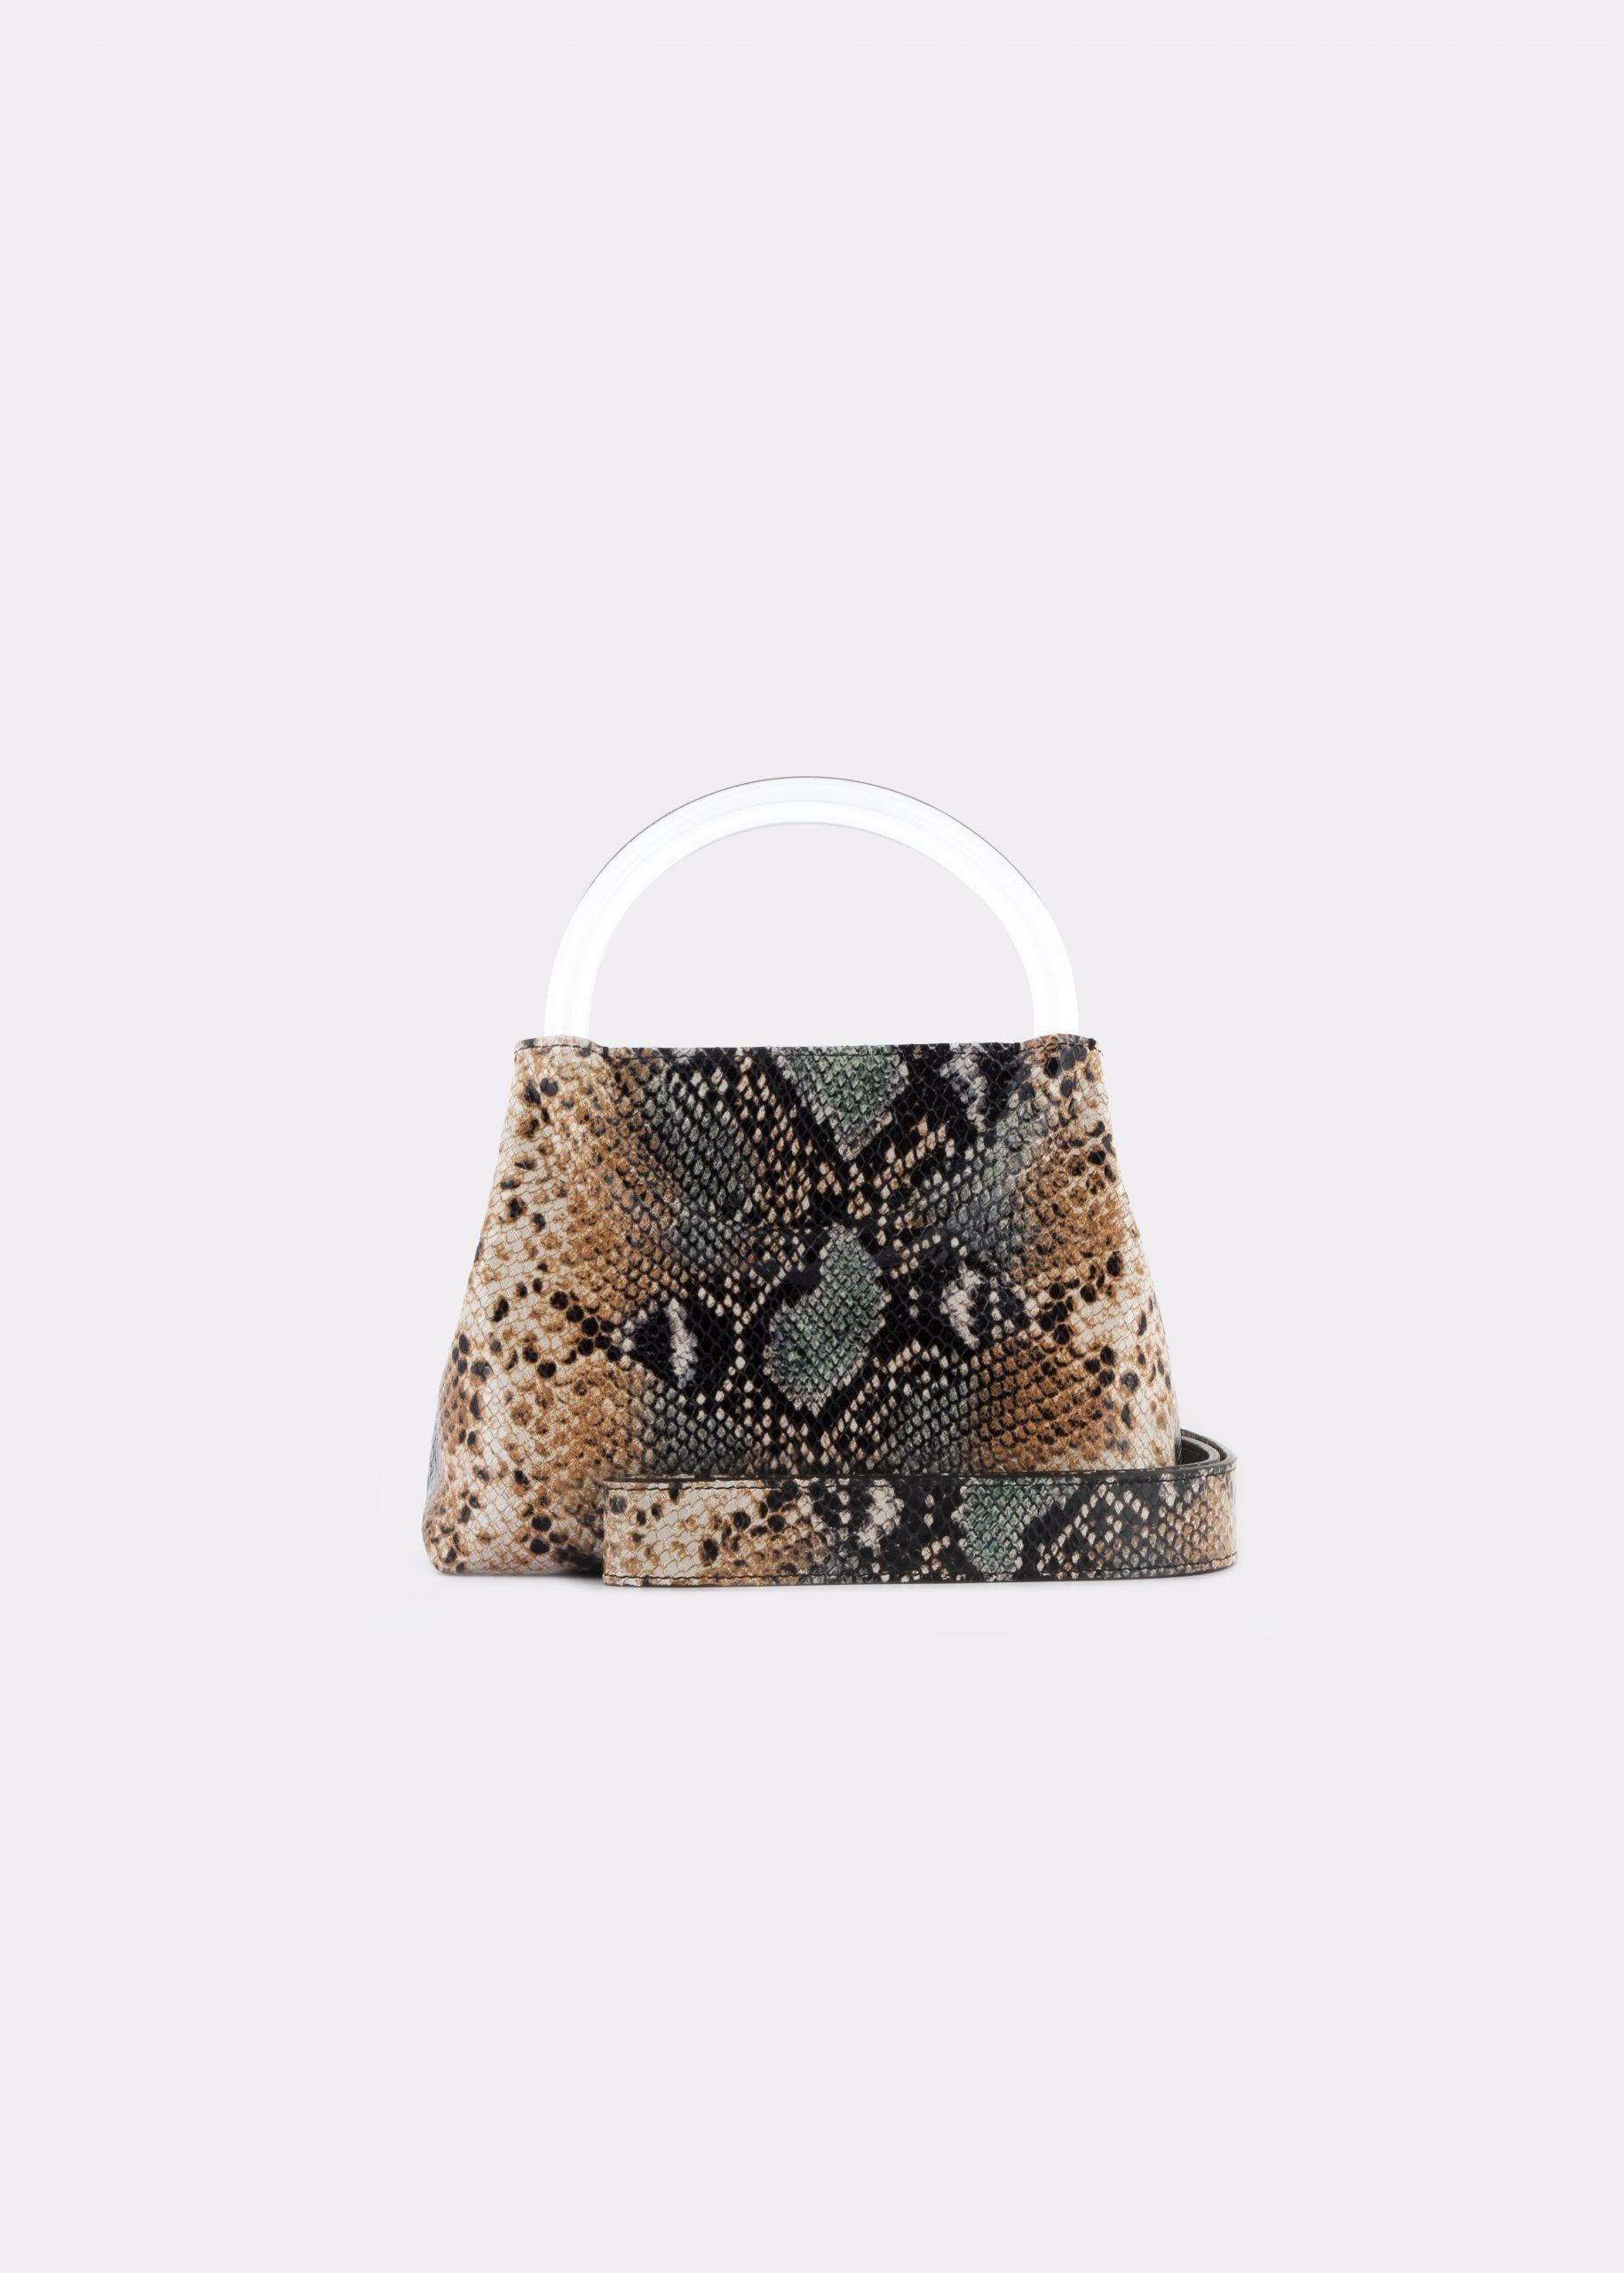 NIDO Bolla Mini Phyton Print/Plexy_shoulder strap view